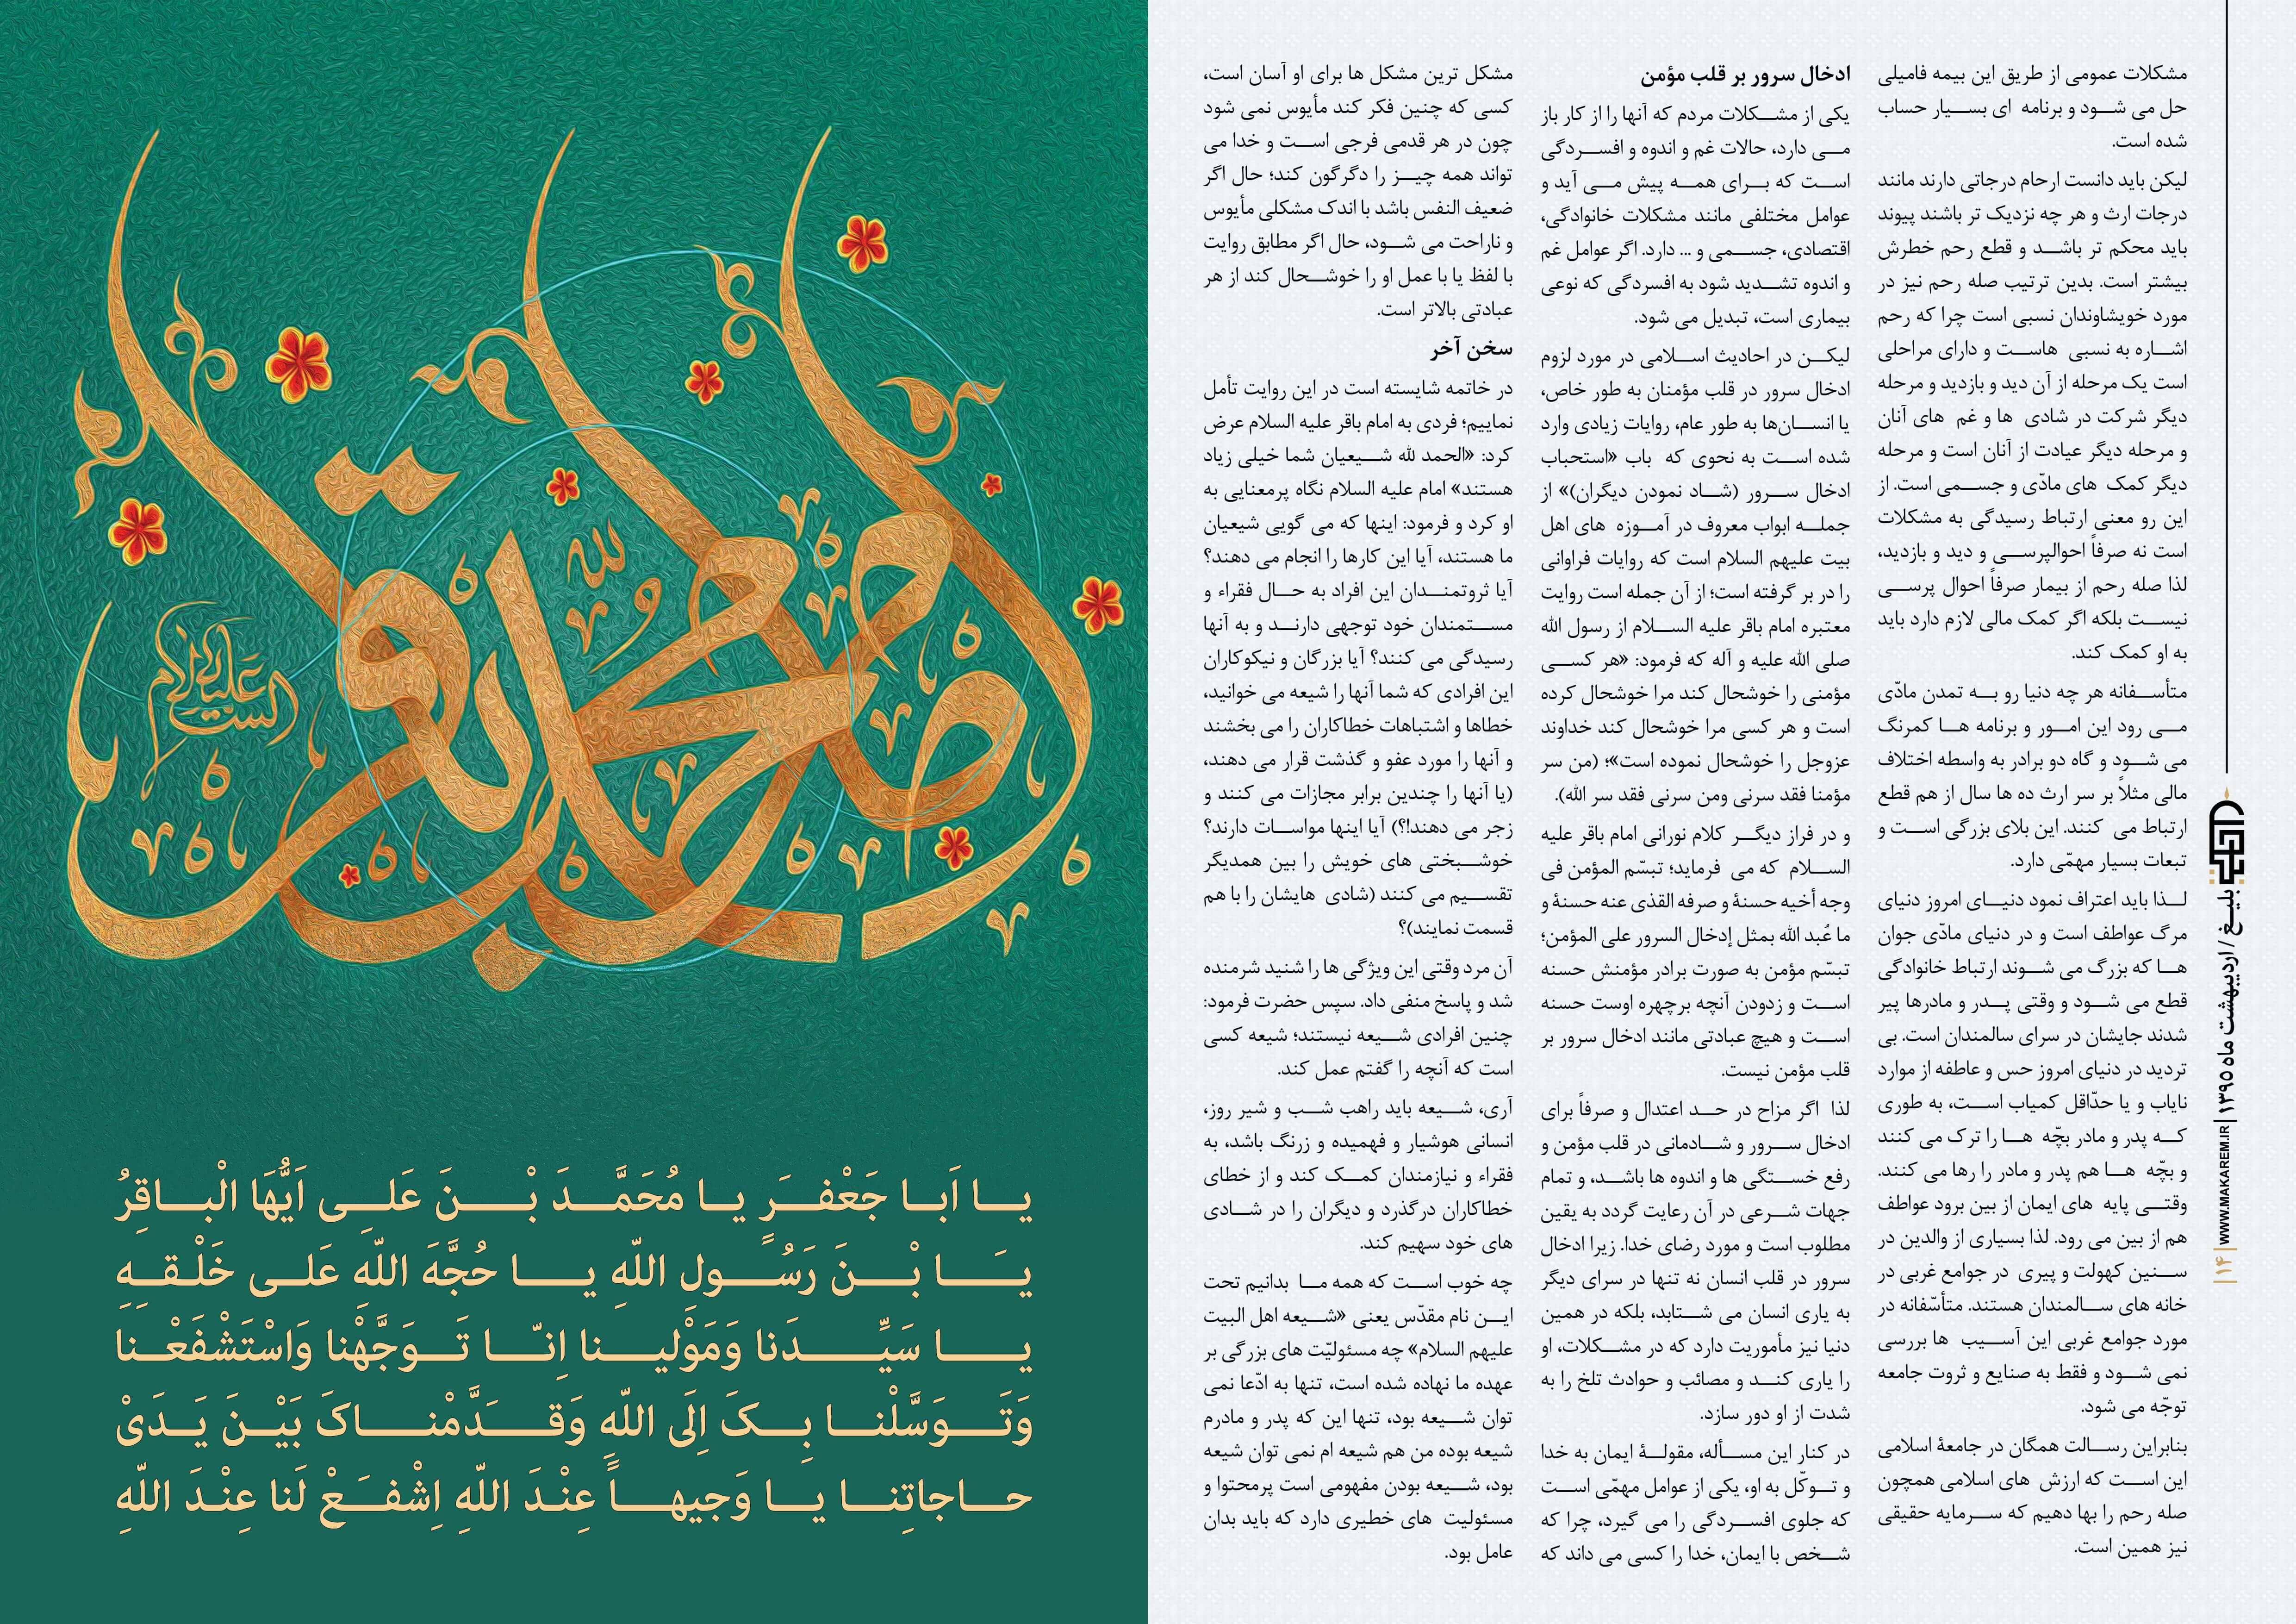 08-مدرسه الامام امیر المومنین (ع)